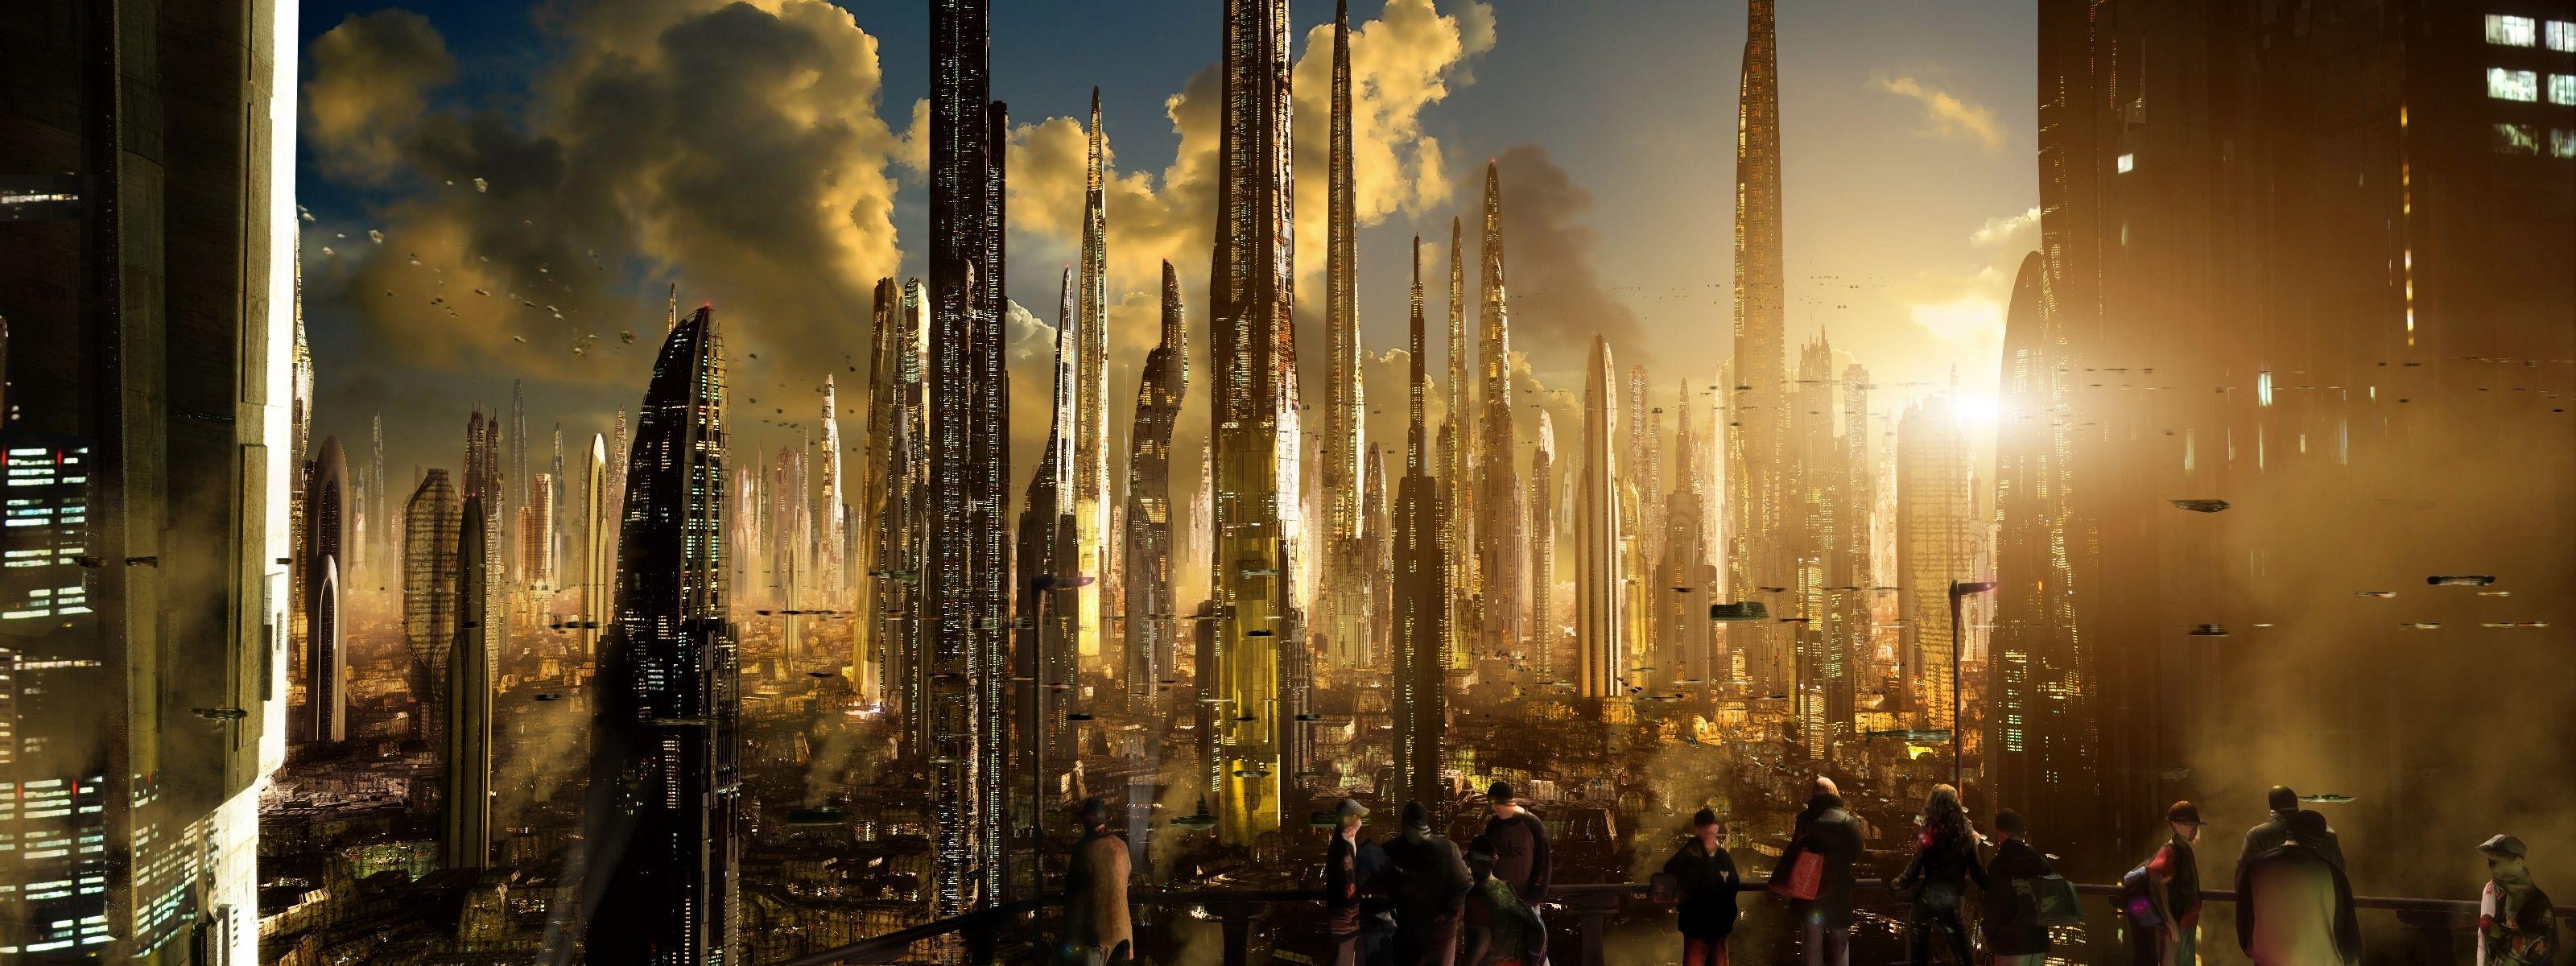 scott-richard-sci-fi-ships-towers-sunset | Science Fiction ...